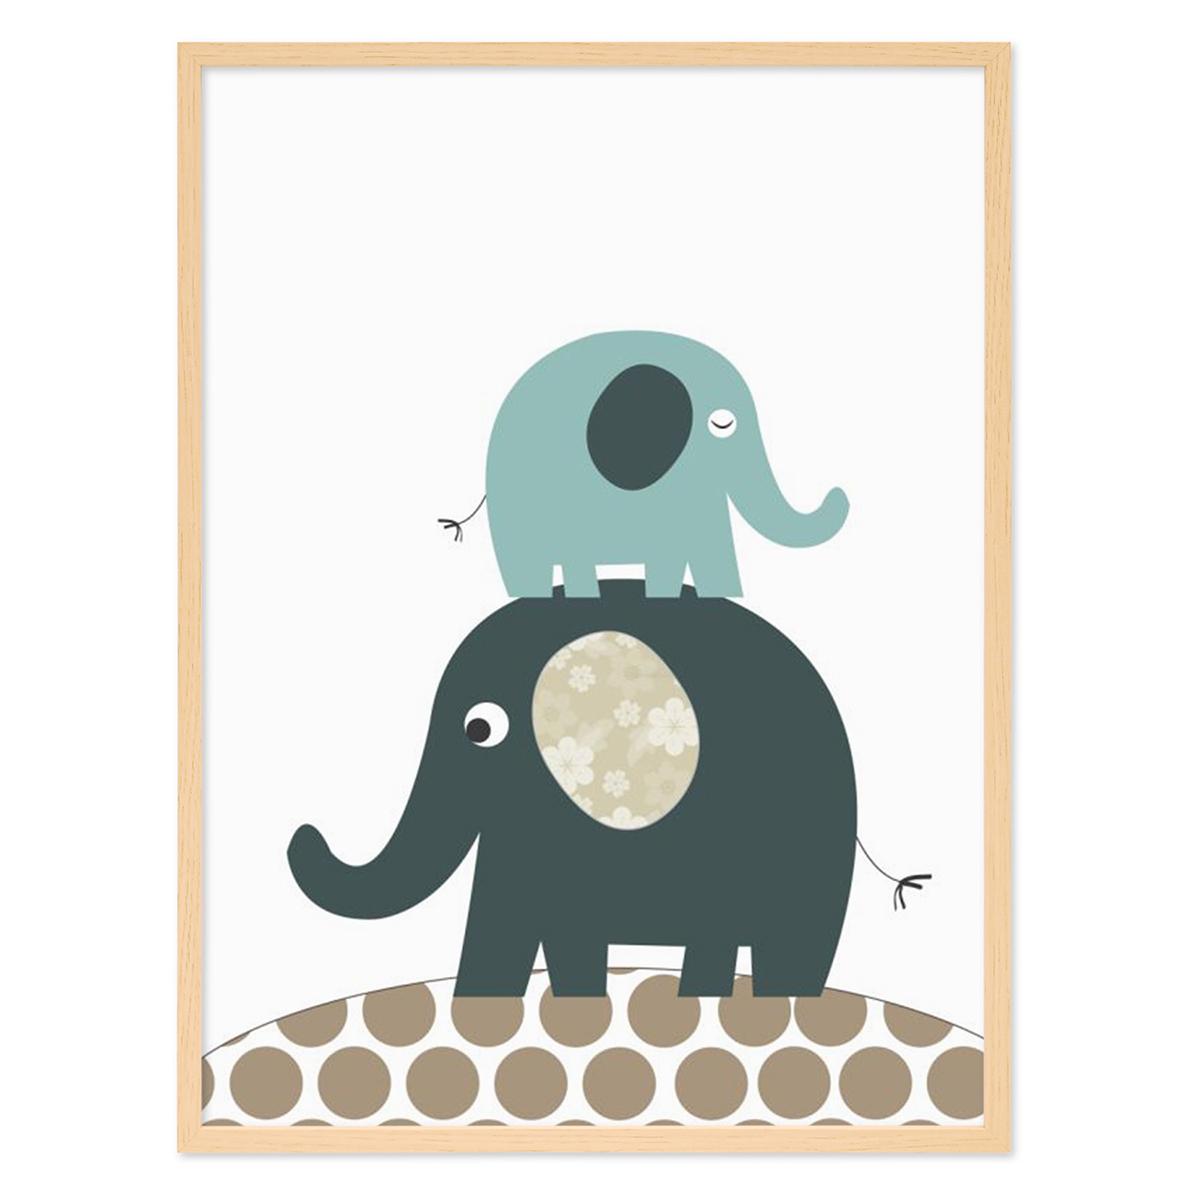 kinder poster mit bilderrahmen natur 39 elefanten 39 30x40 cm kinderzimmer poster blau tier bild. Black Bedroom Furniture Sets. Home Design Ideas